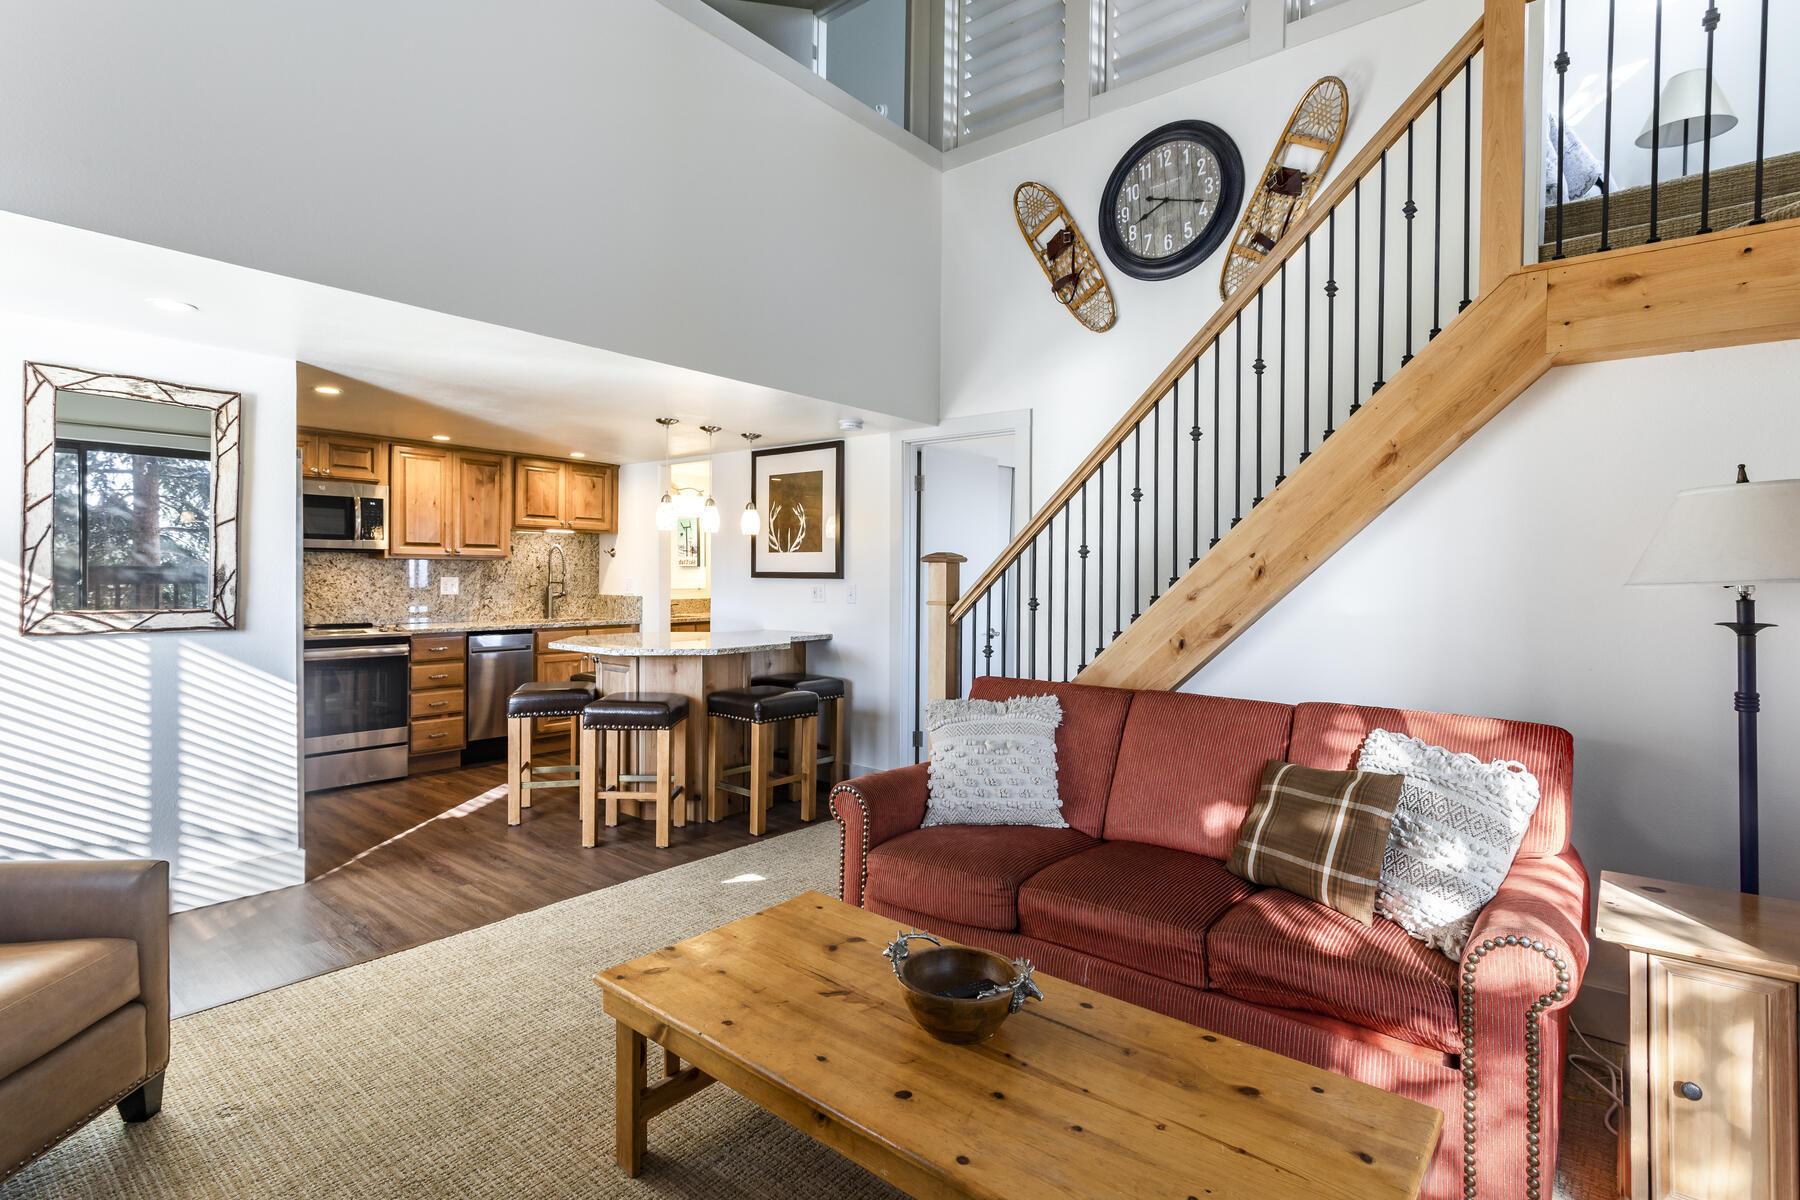 2025 Canyons Resort Drive, Park City, Utah 84098, 2 Bedrooms Bedrooms, ,2 BathroomsBathrooms,Condominium,For Sale,Canyons Resort,12101450